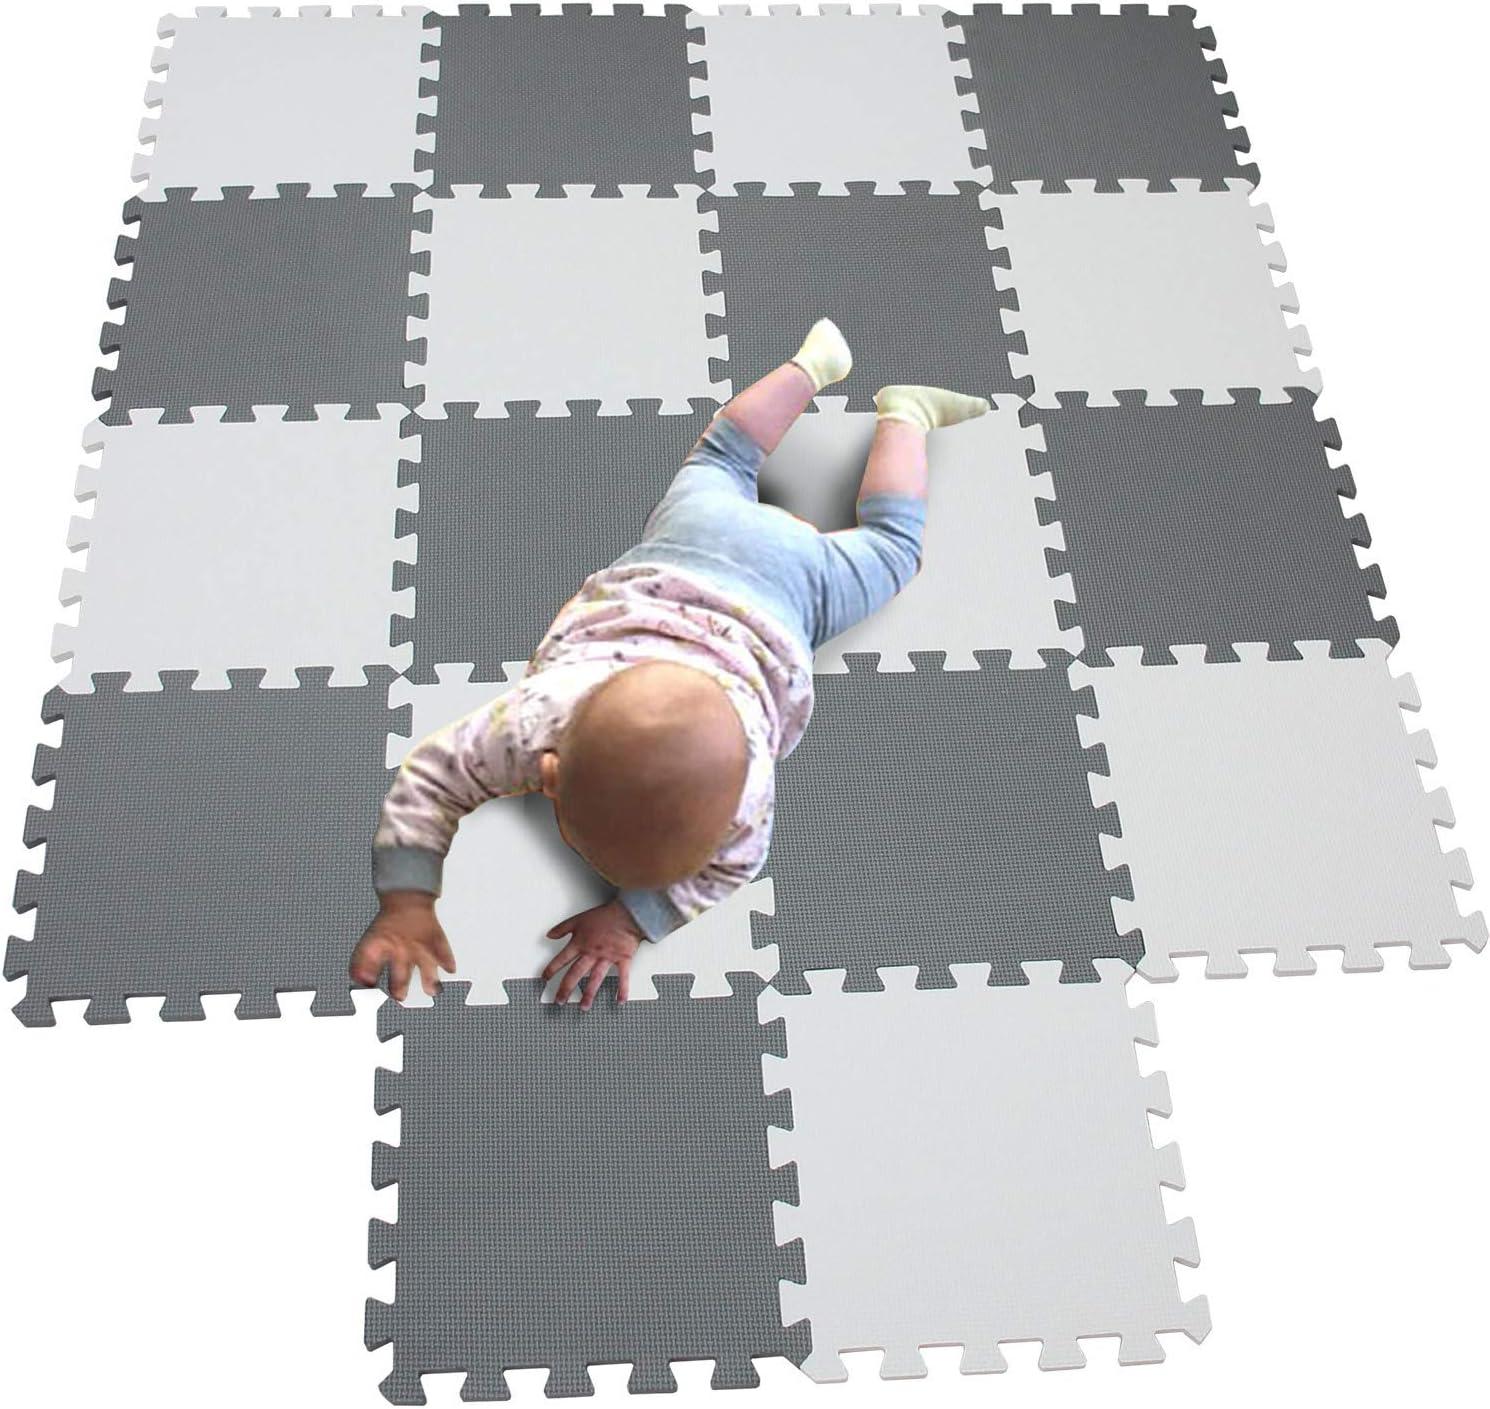 Pink EVA Foam Interlocking Tiles Baby Kids Crawling Carpet Rug Play Mat Non-Toxic Soft Puzzle Mat Exercise Mat for Exercise Sport Yoga Gym